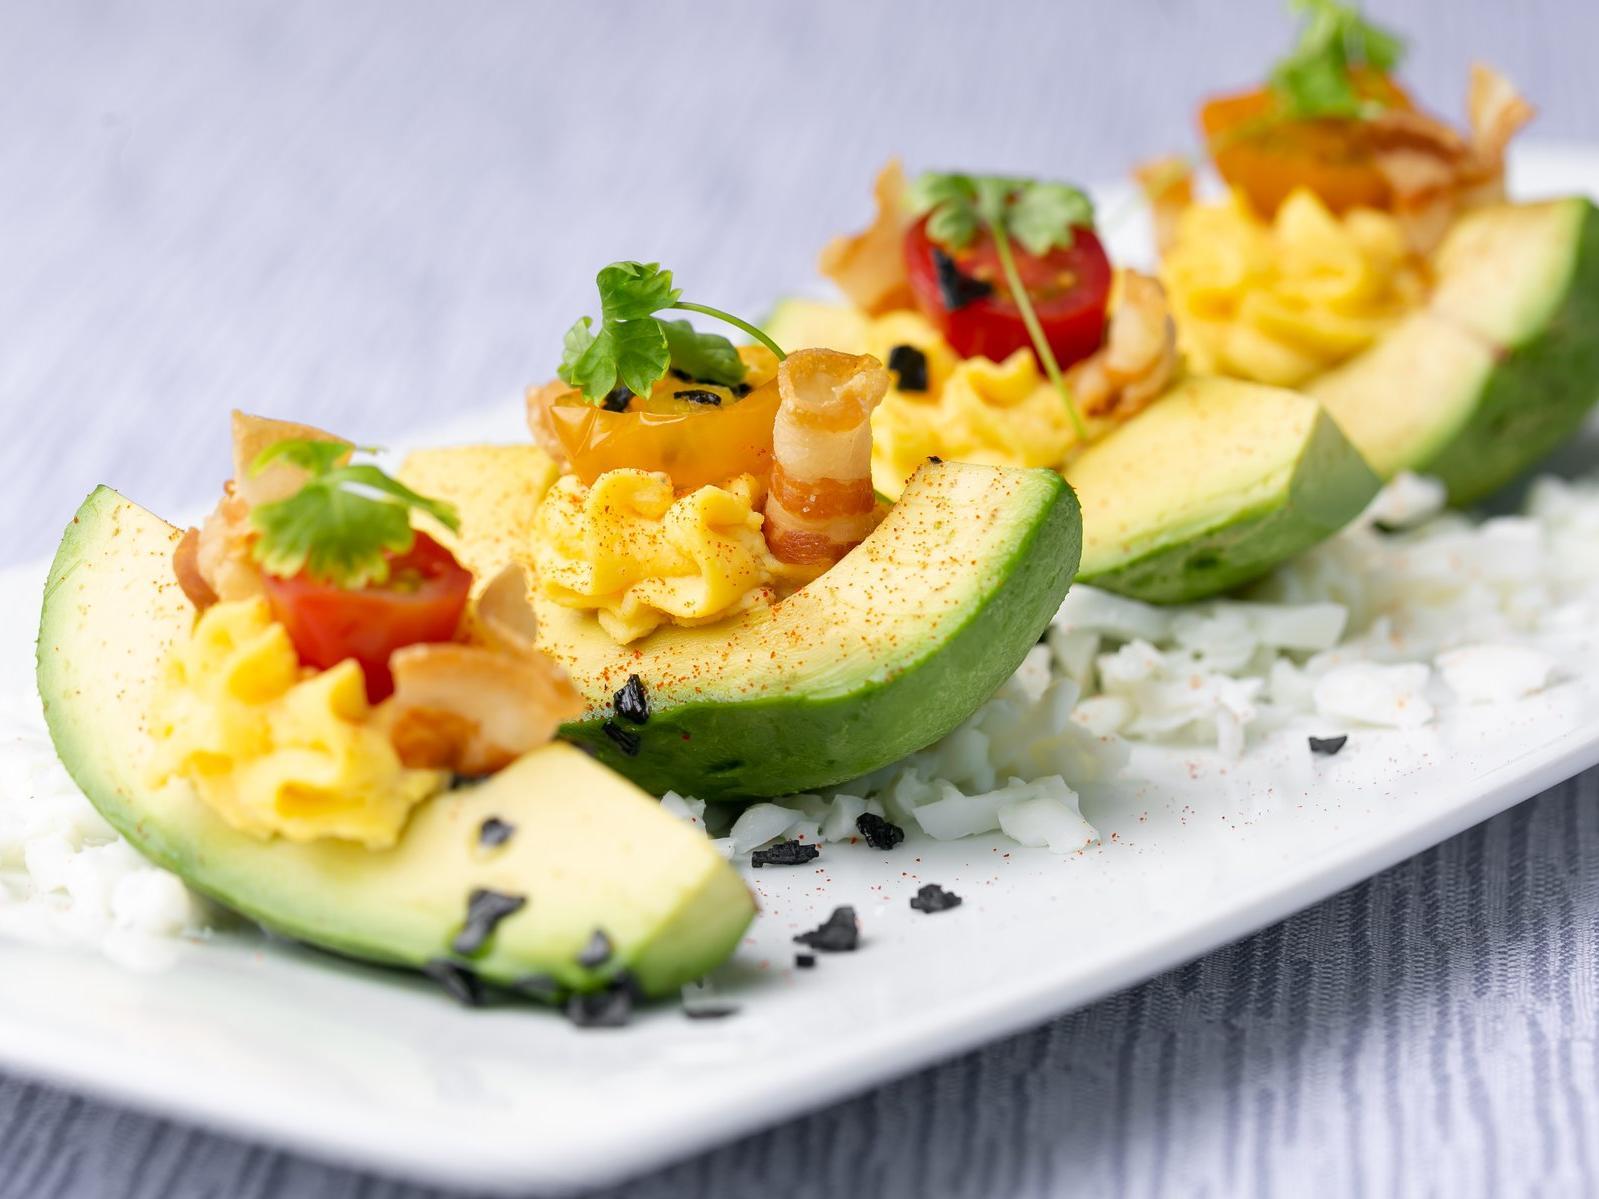 slices of avocado